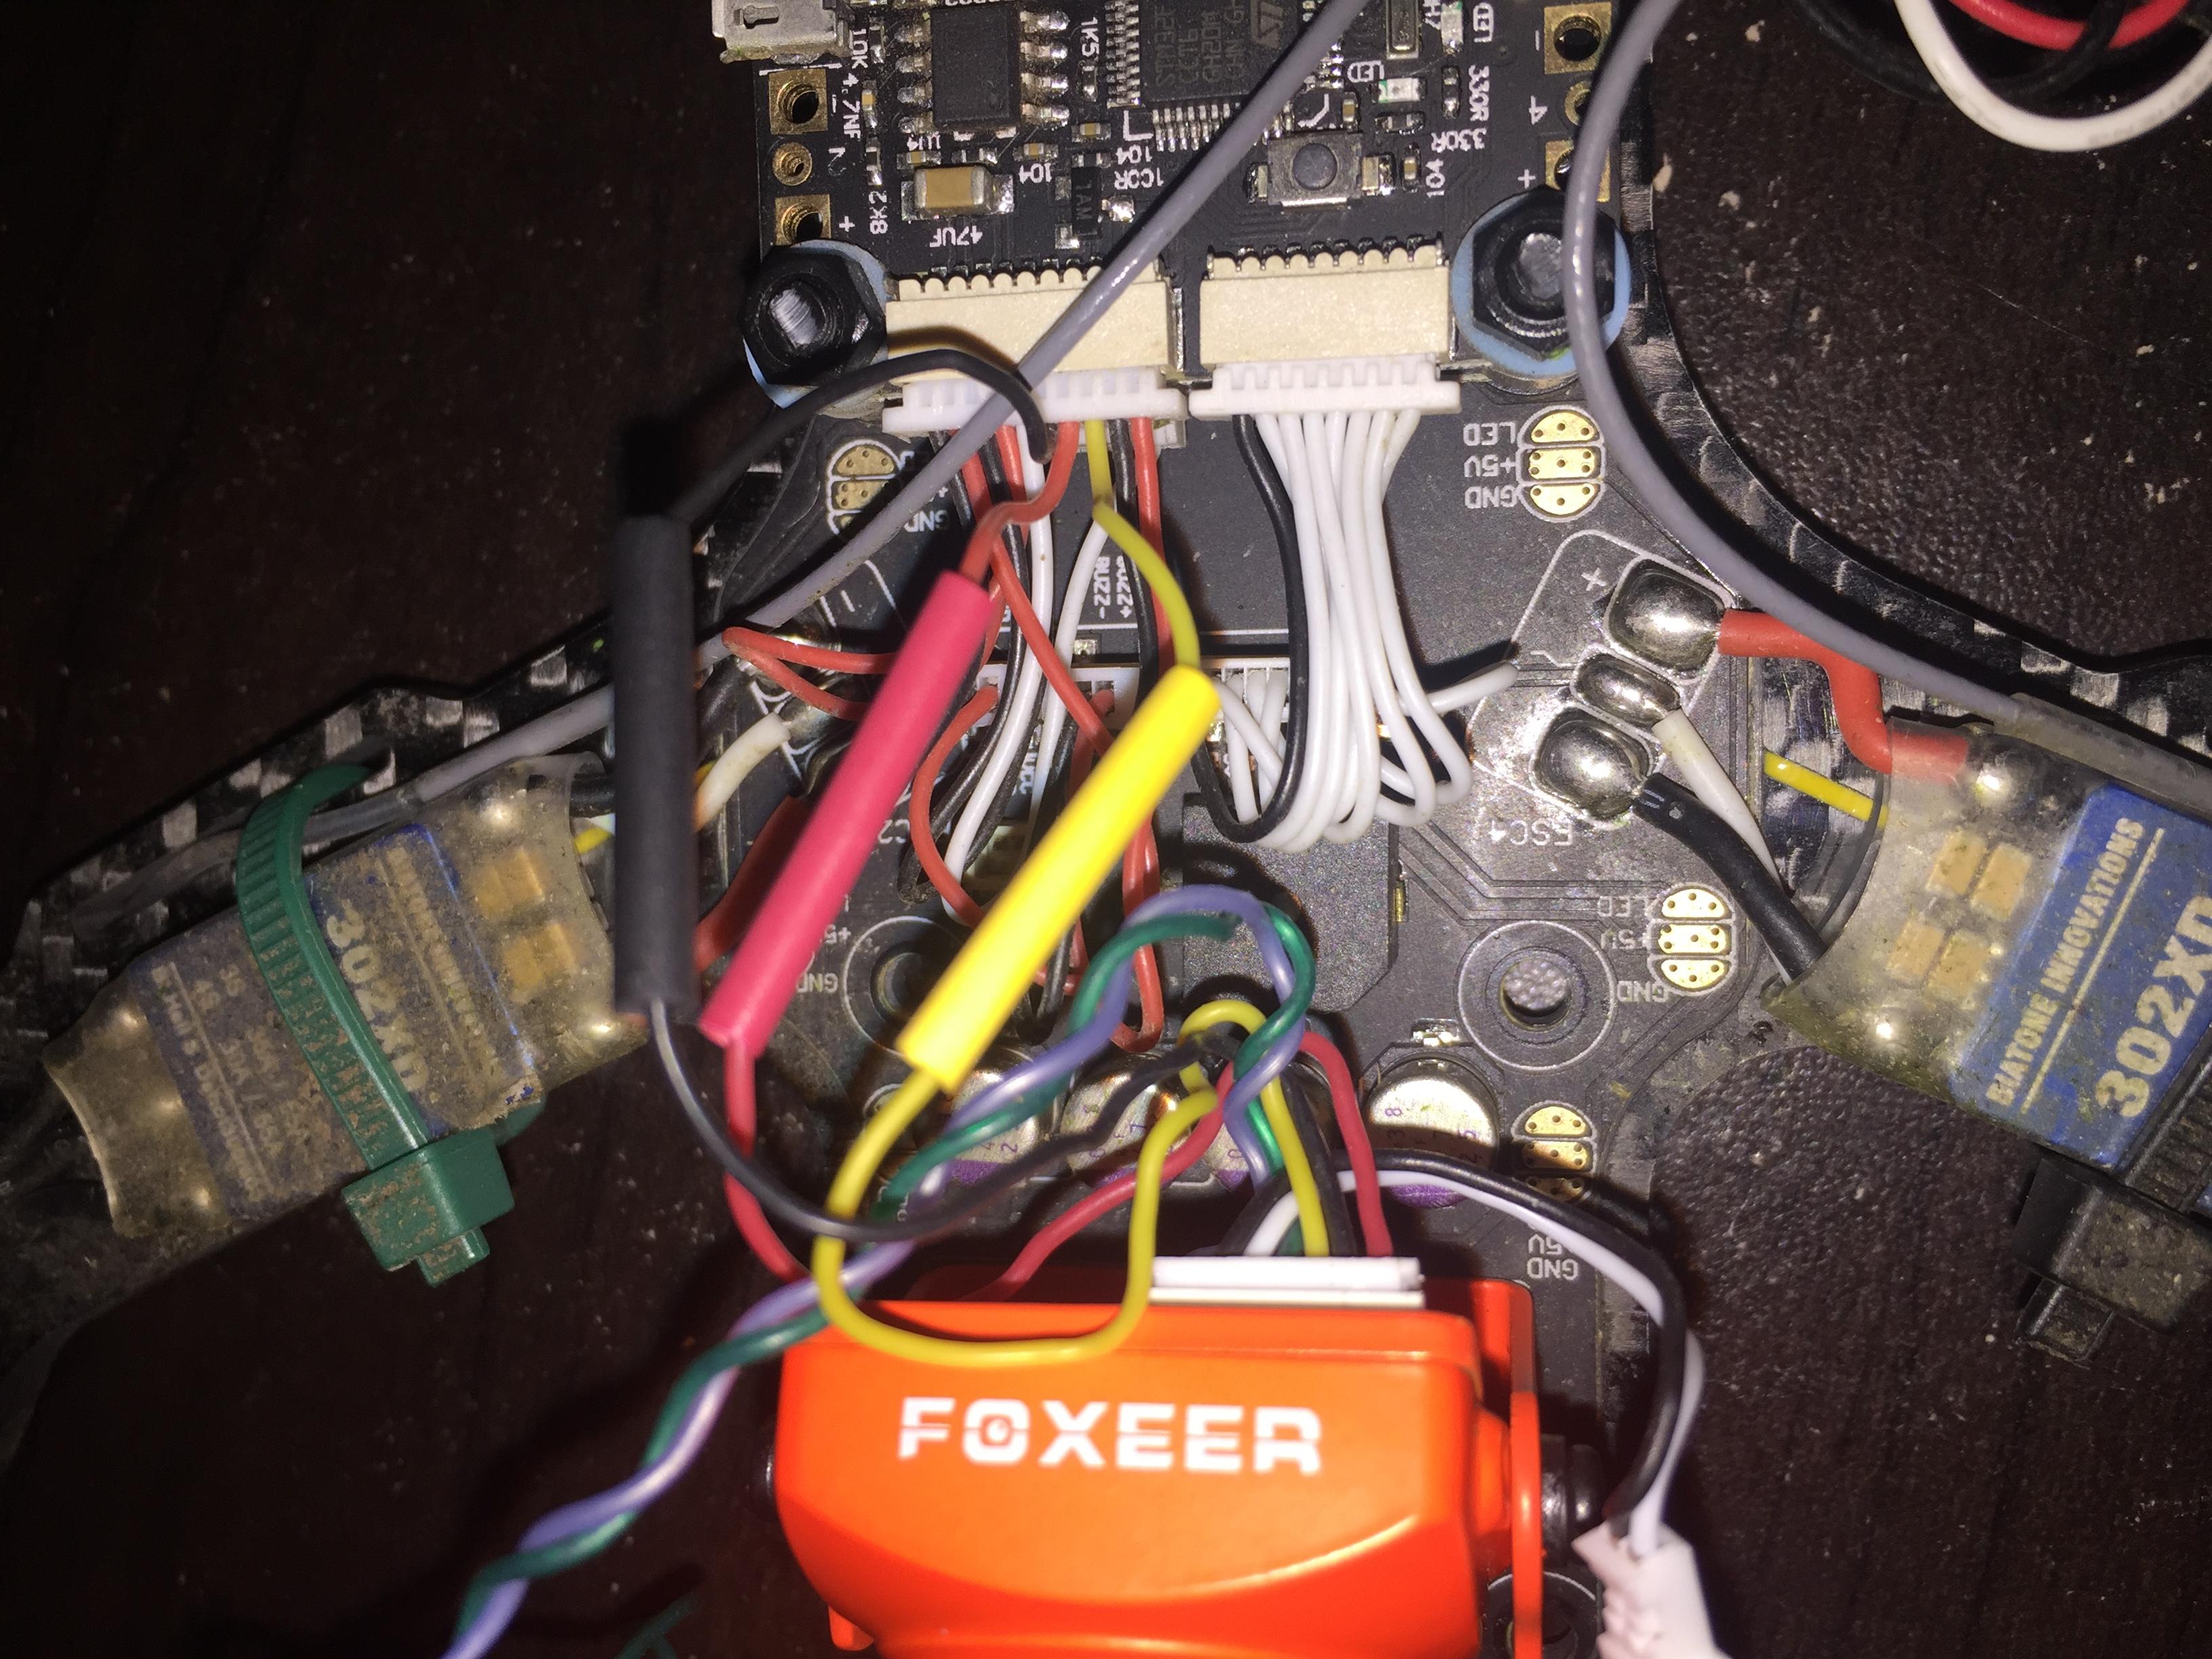 Osd Does Not Work With Ntsc 169 Cameras Issue 3760 Betaflight Pal Camera Development Board 34026056 1c332ed0 E119 11e7 9590 A4f4e9791775